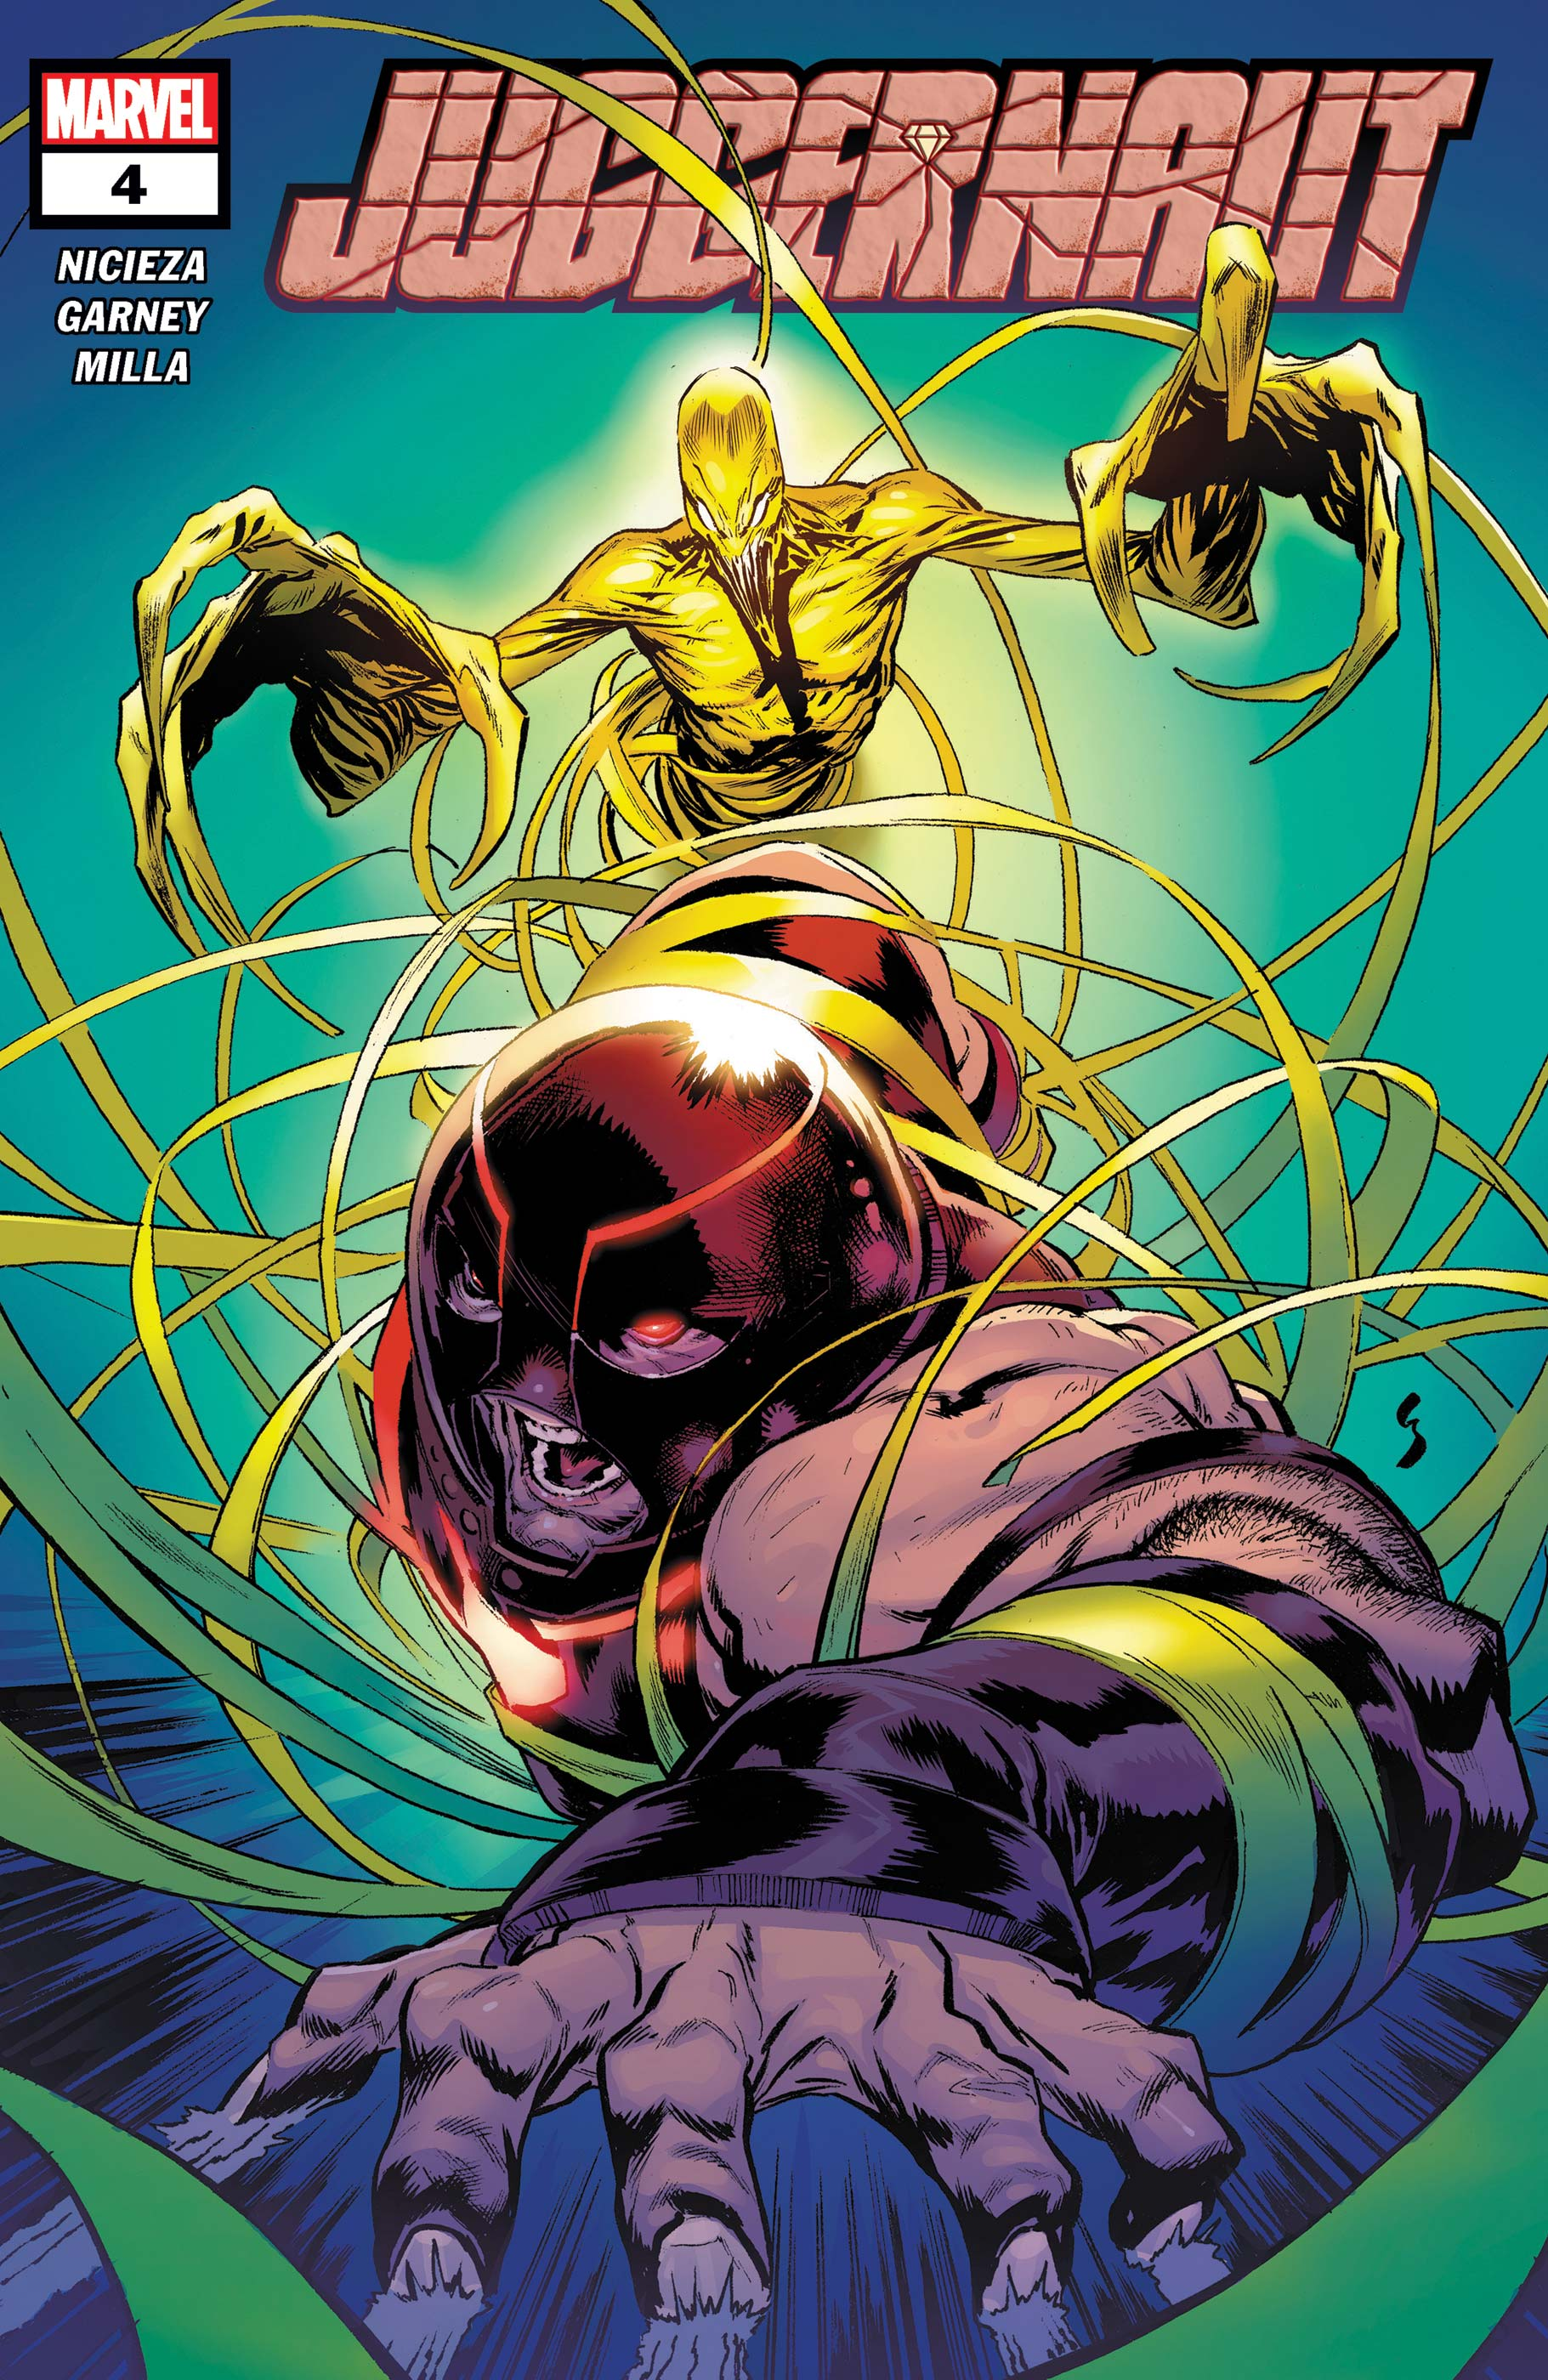 Juggernaut (2020) #4